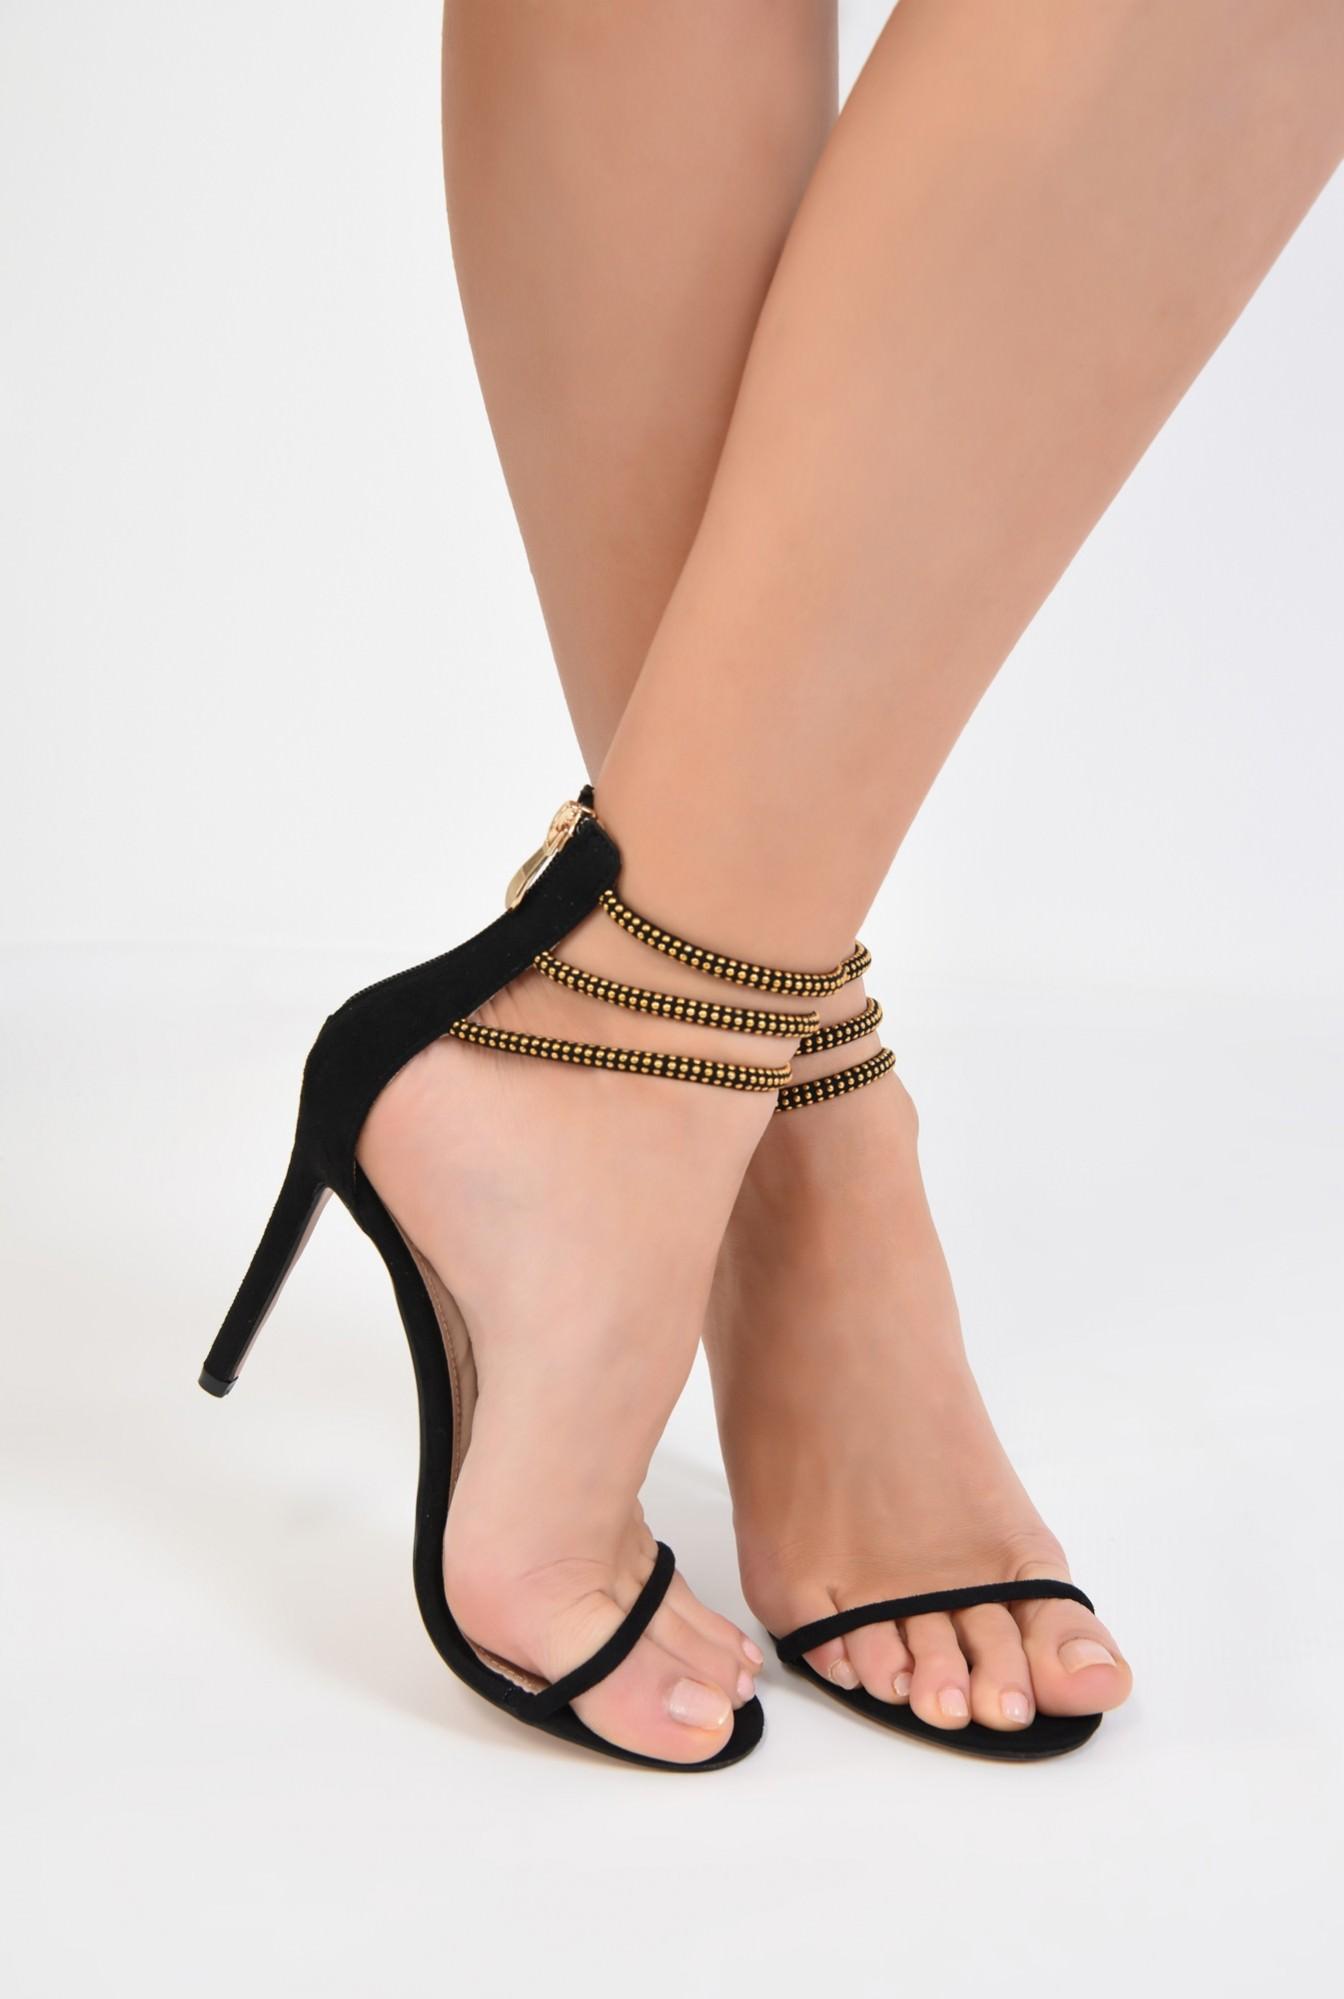 4 - sandale elegante, negre, toc inalt, barete cu aplicatii metalice